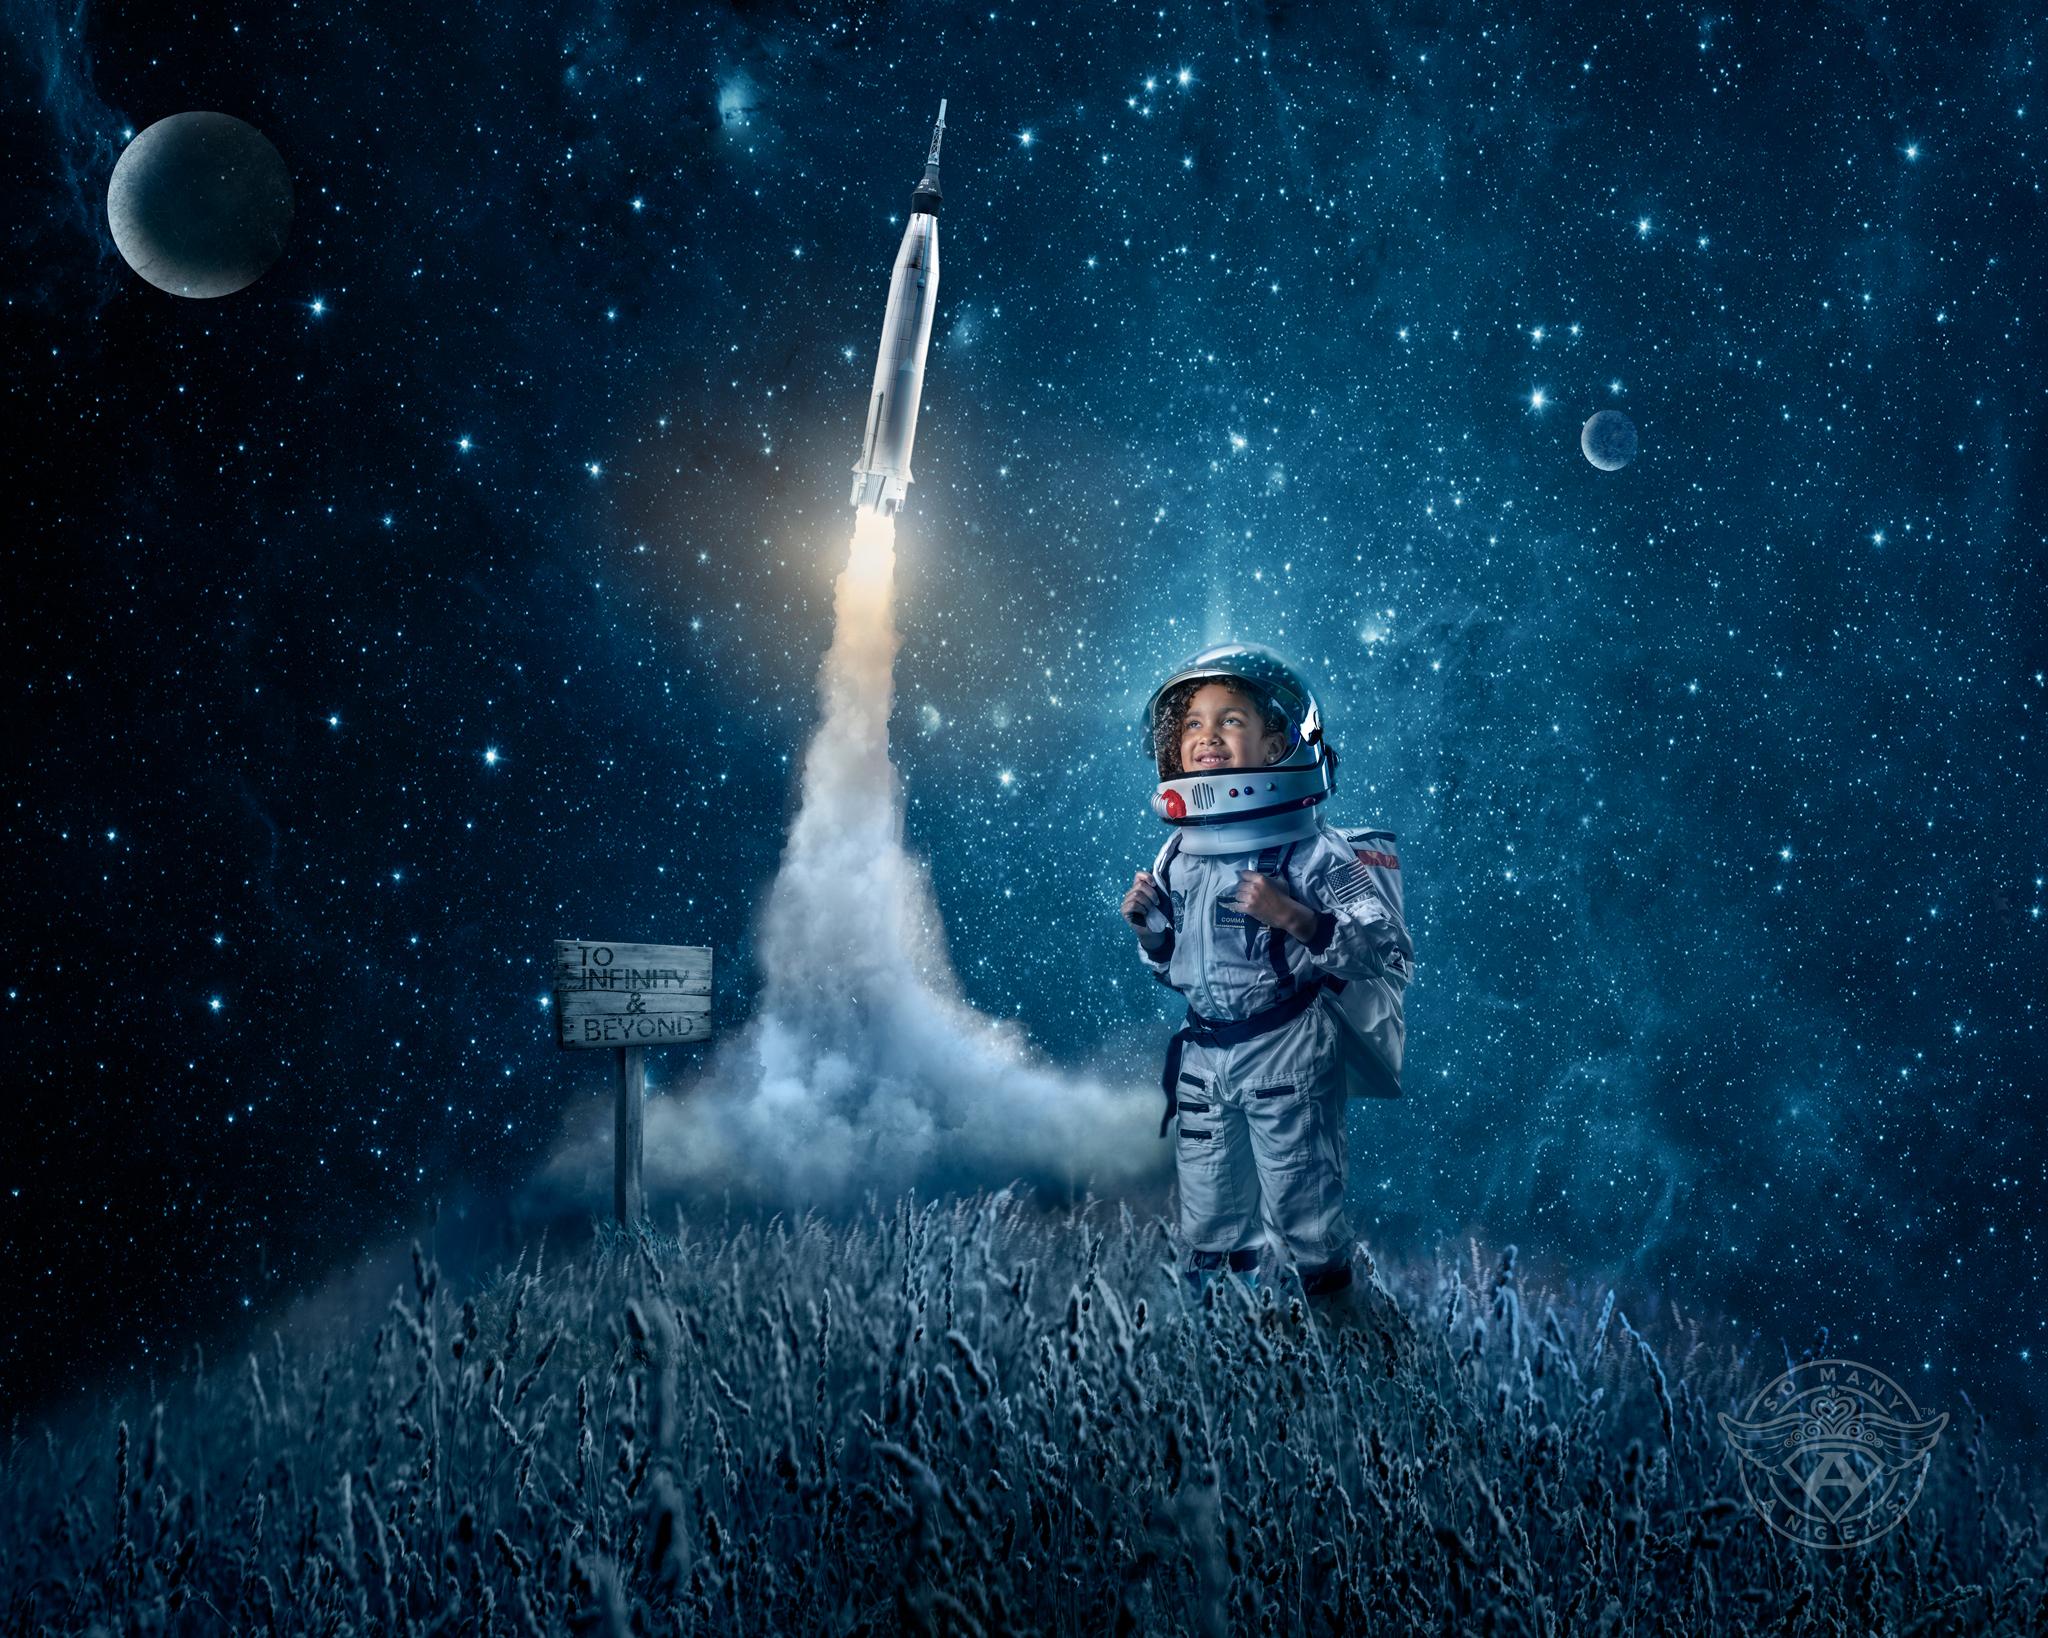 2019-So-Many-Angels-ATL-Maybin-Astronaut-Social-Media.jpg